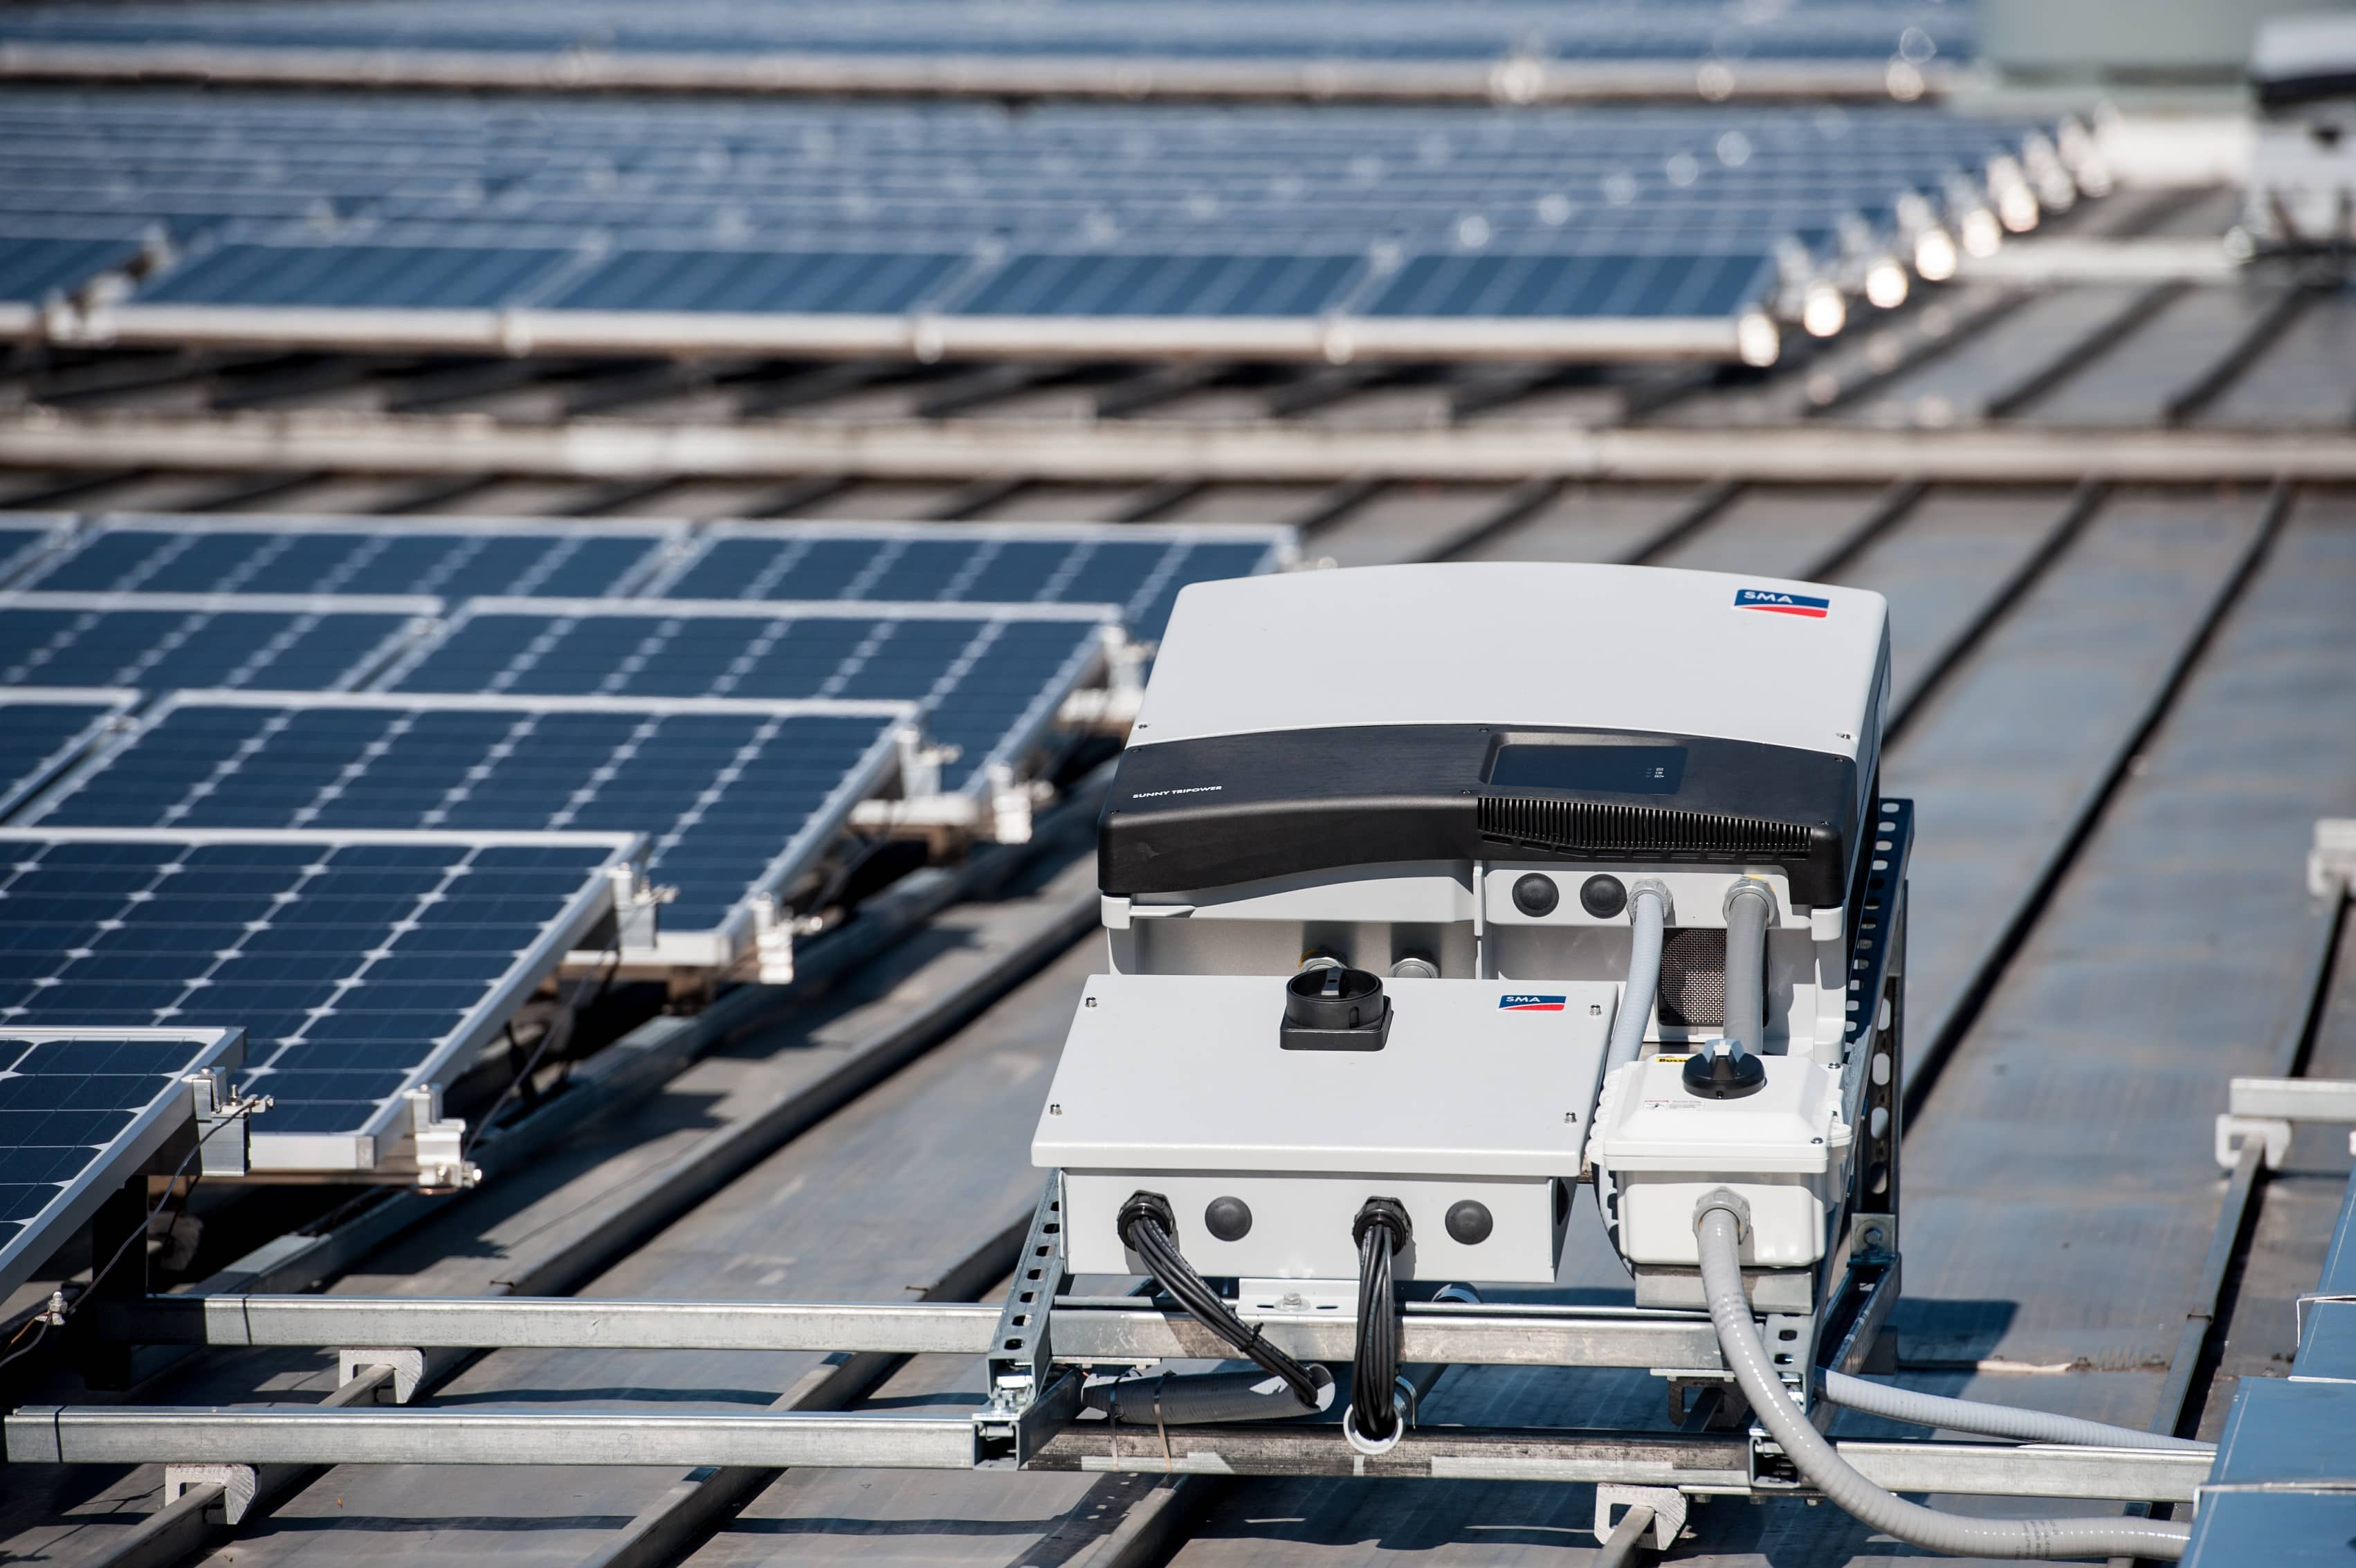 sma IHS Scorecard Highlights Top Solar Inverter Suppliers